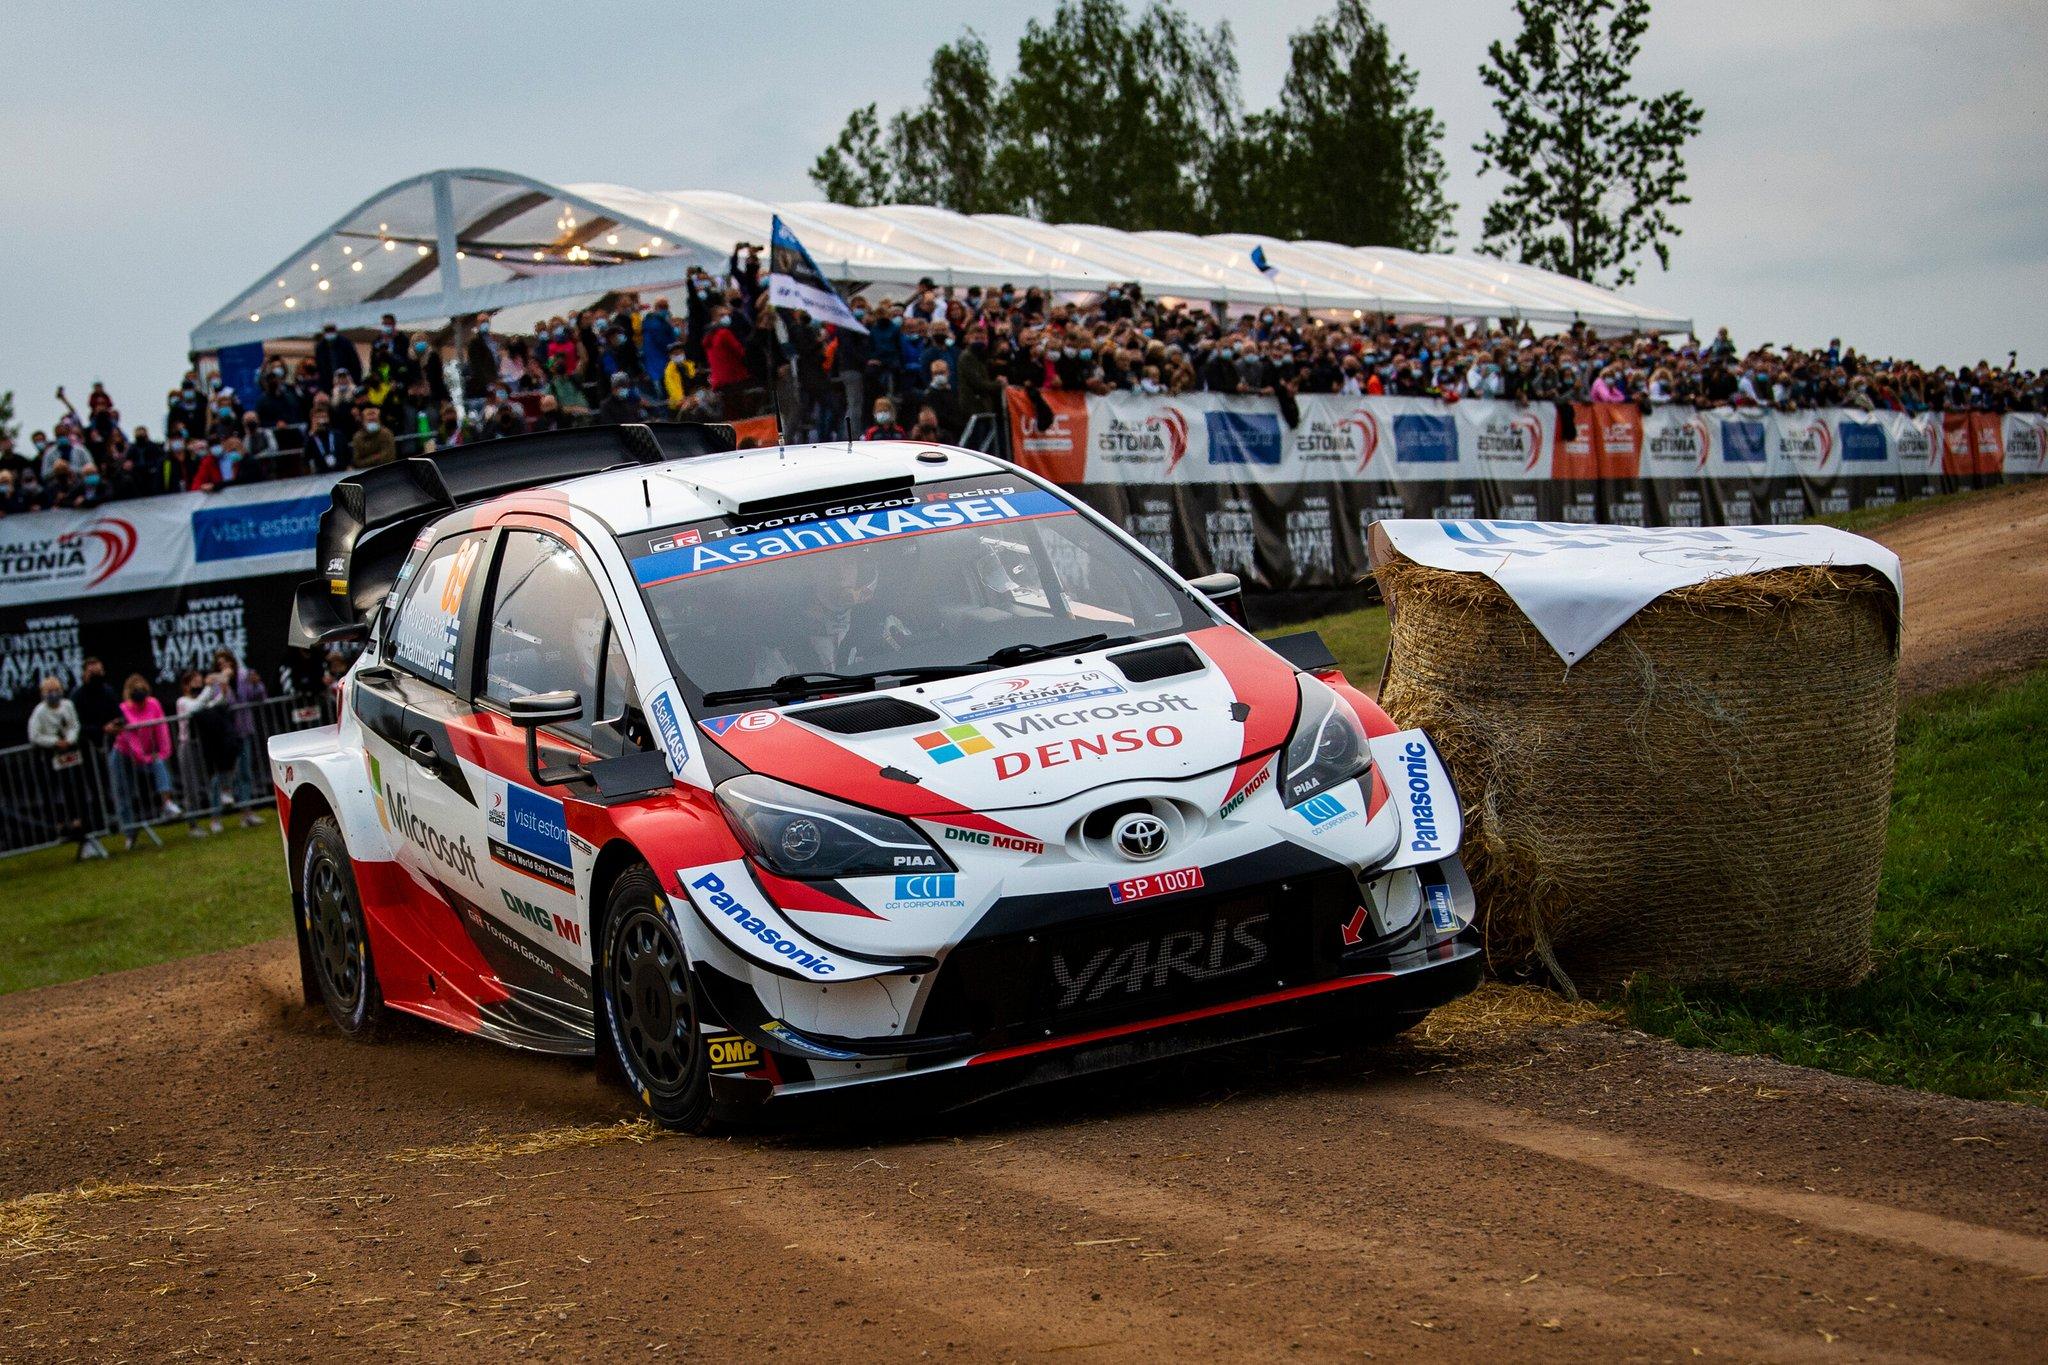 WRC: 10º Rallye Estonia [4-6 Septiembre] - Página 5 EhKaOQbXkAA5rAr?format=jpg&name=large